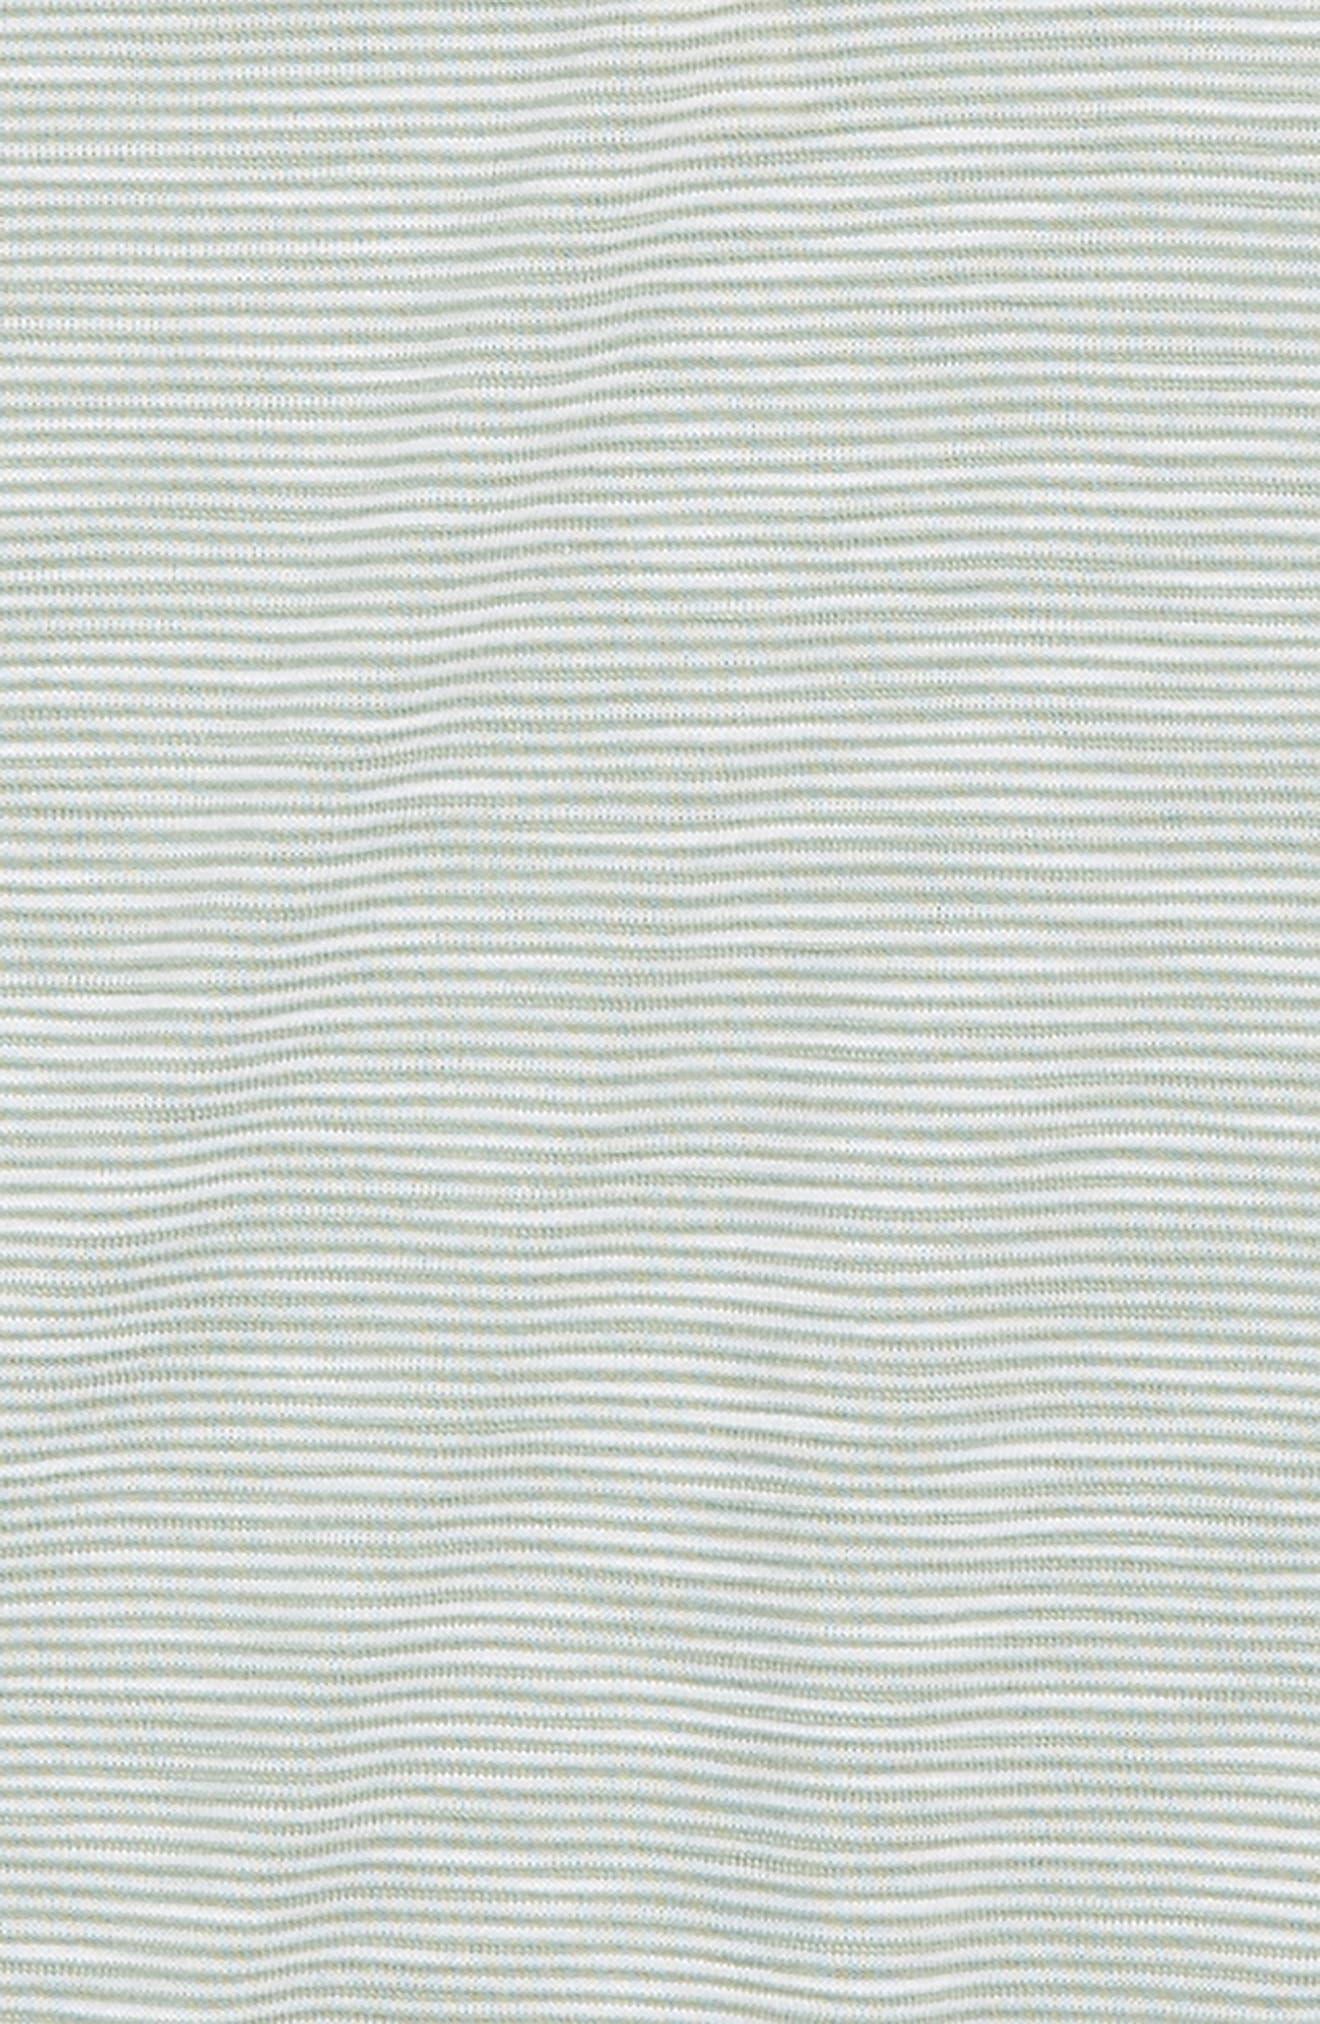 Stripe Peplum Tank,                             Alternate thumbnail 2, color,                             Green Hedge- White Stripe